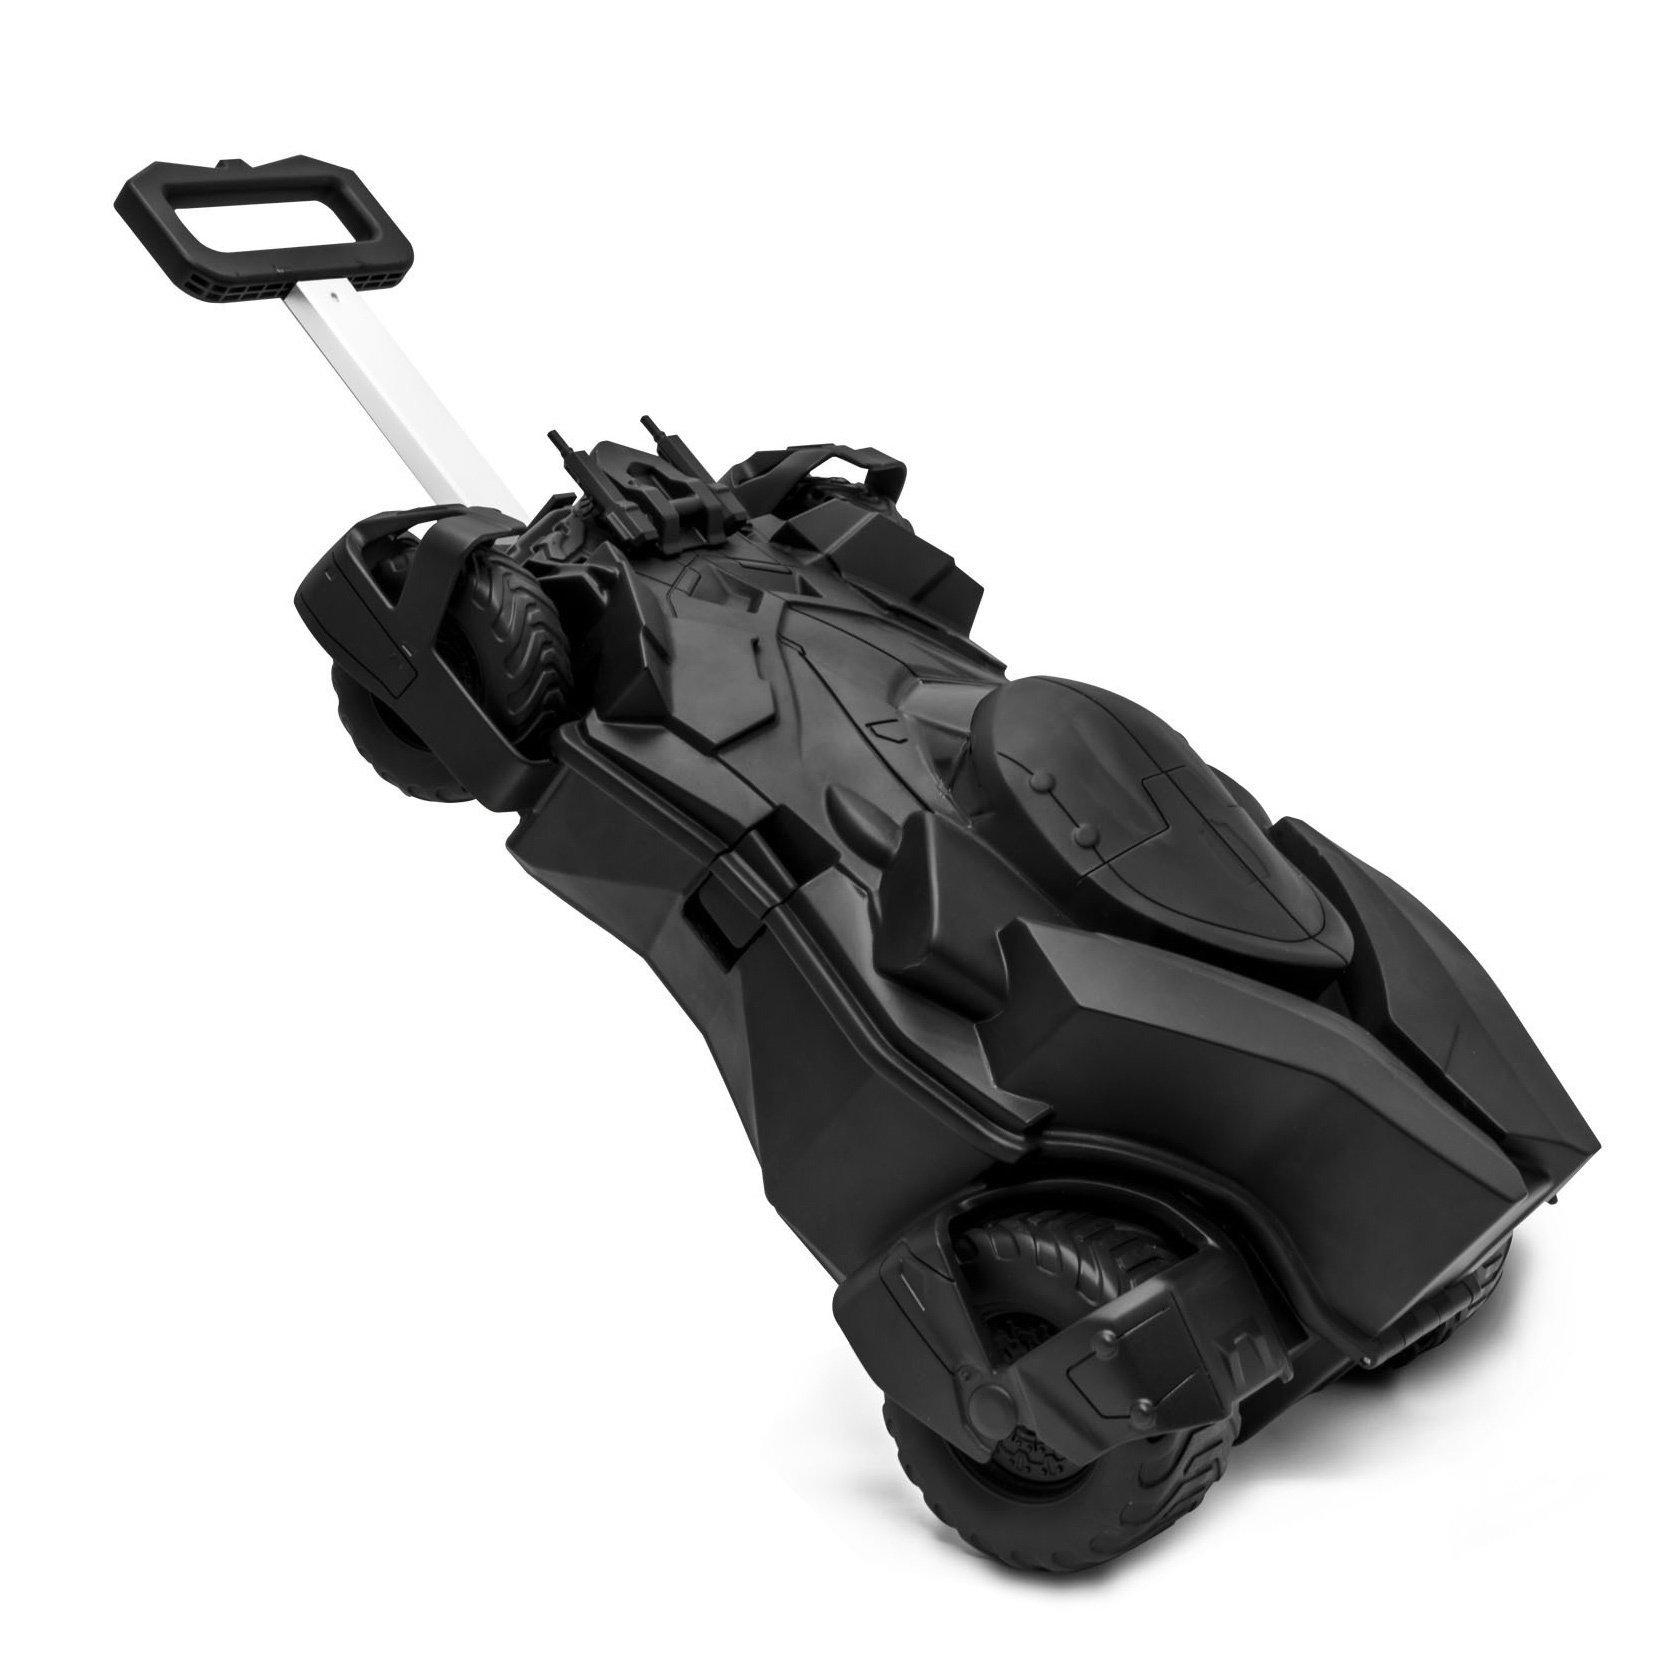 Kids Black Batman Batmobile Theme Wheeled Upright Rolling Suitcase, Beautiful 3D Design Super Heroes Pattern Car Carry on, Travel Wheeled Suit Bag with Wheels, Wheeling Luggage, Fashionable